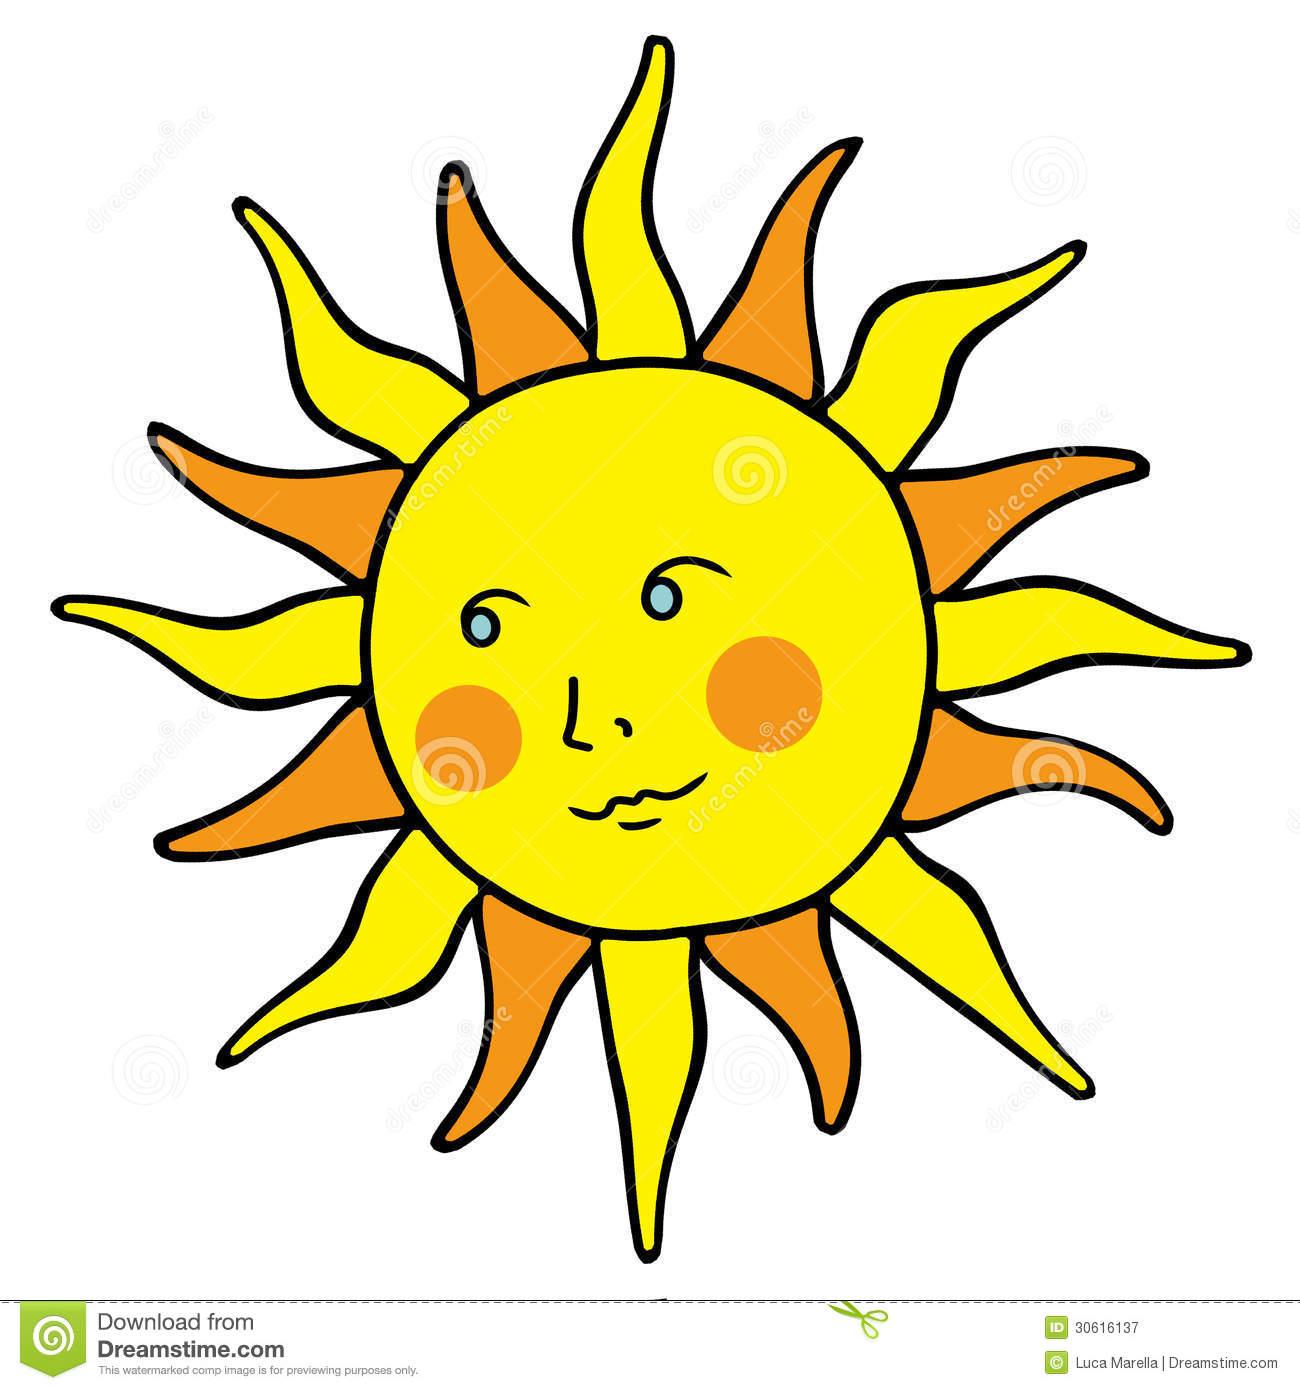 Moving clipart sunshine Animated Free School Sun Free